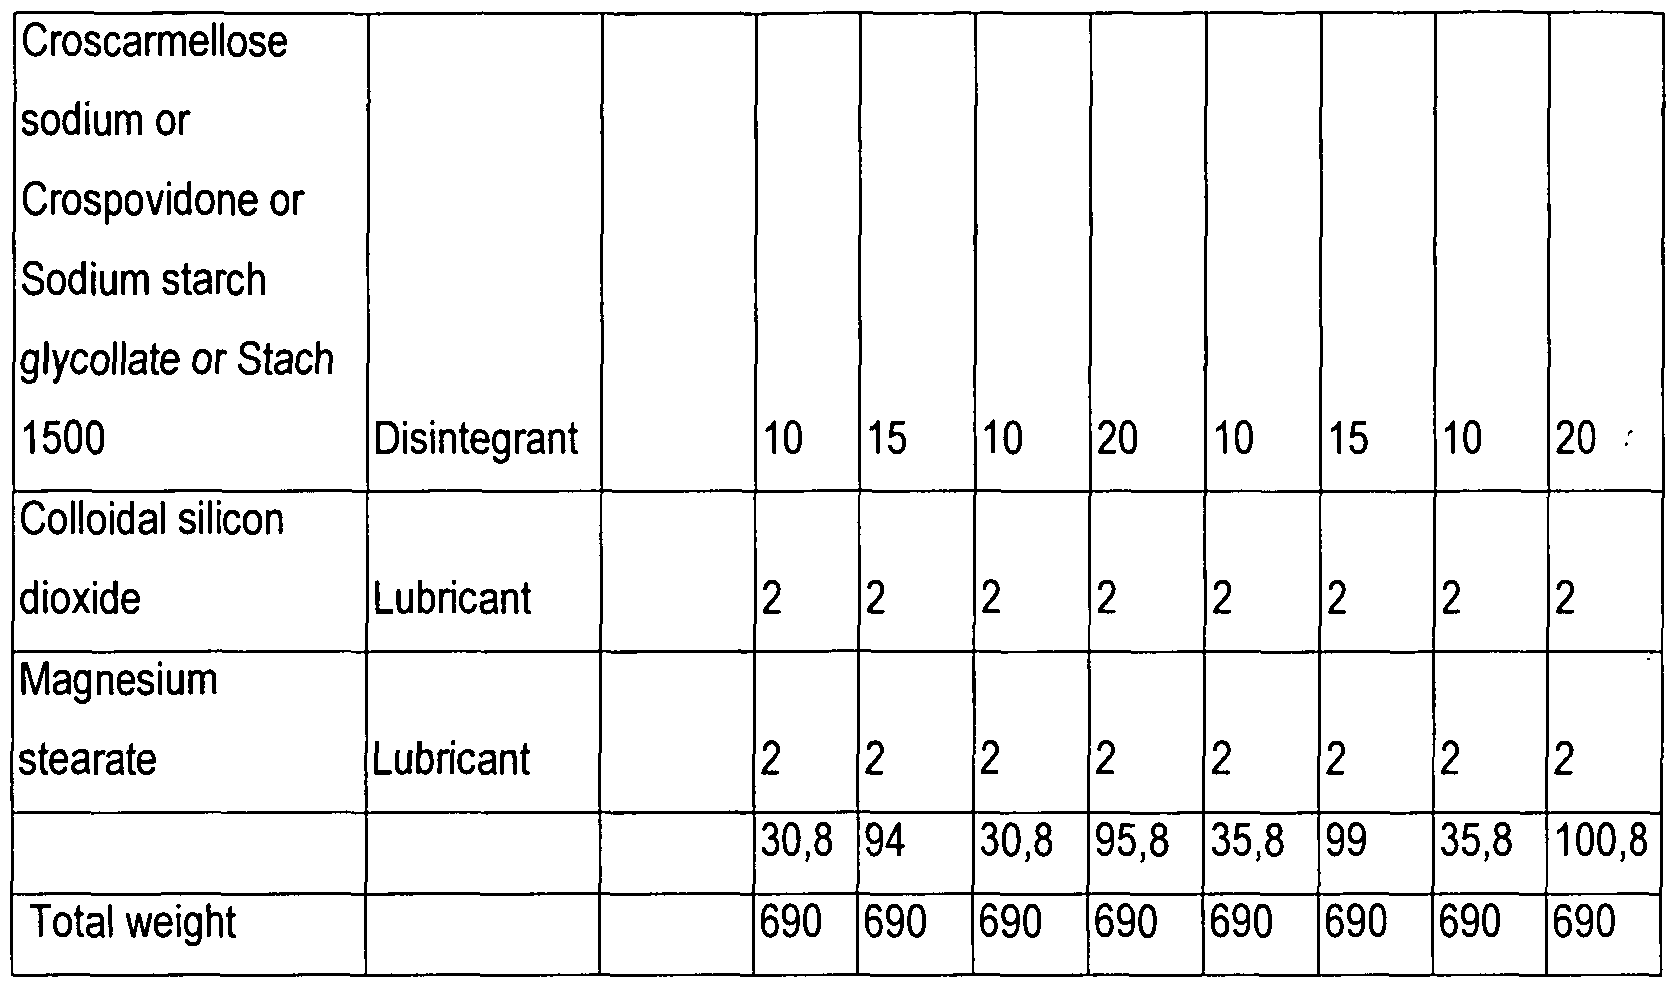 Levofloxacin hemihydrate usp 35 monograph.doc - Figure Imgf000068_0001